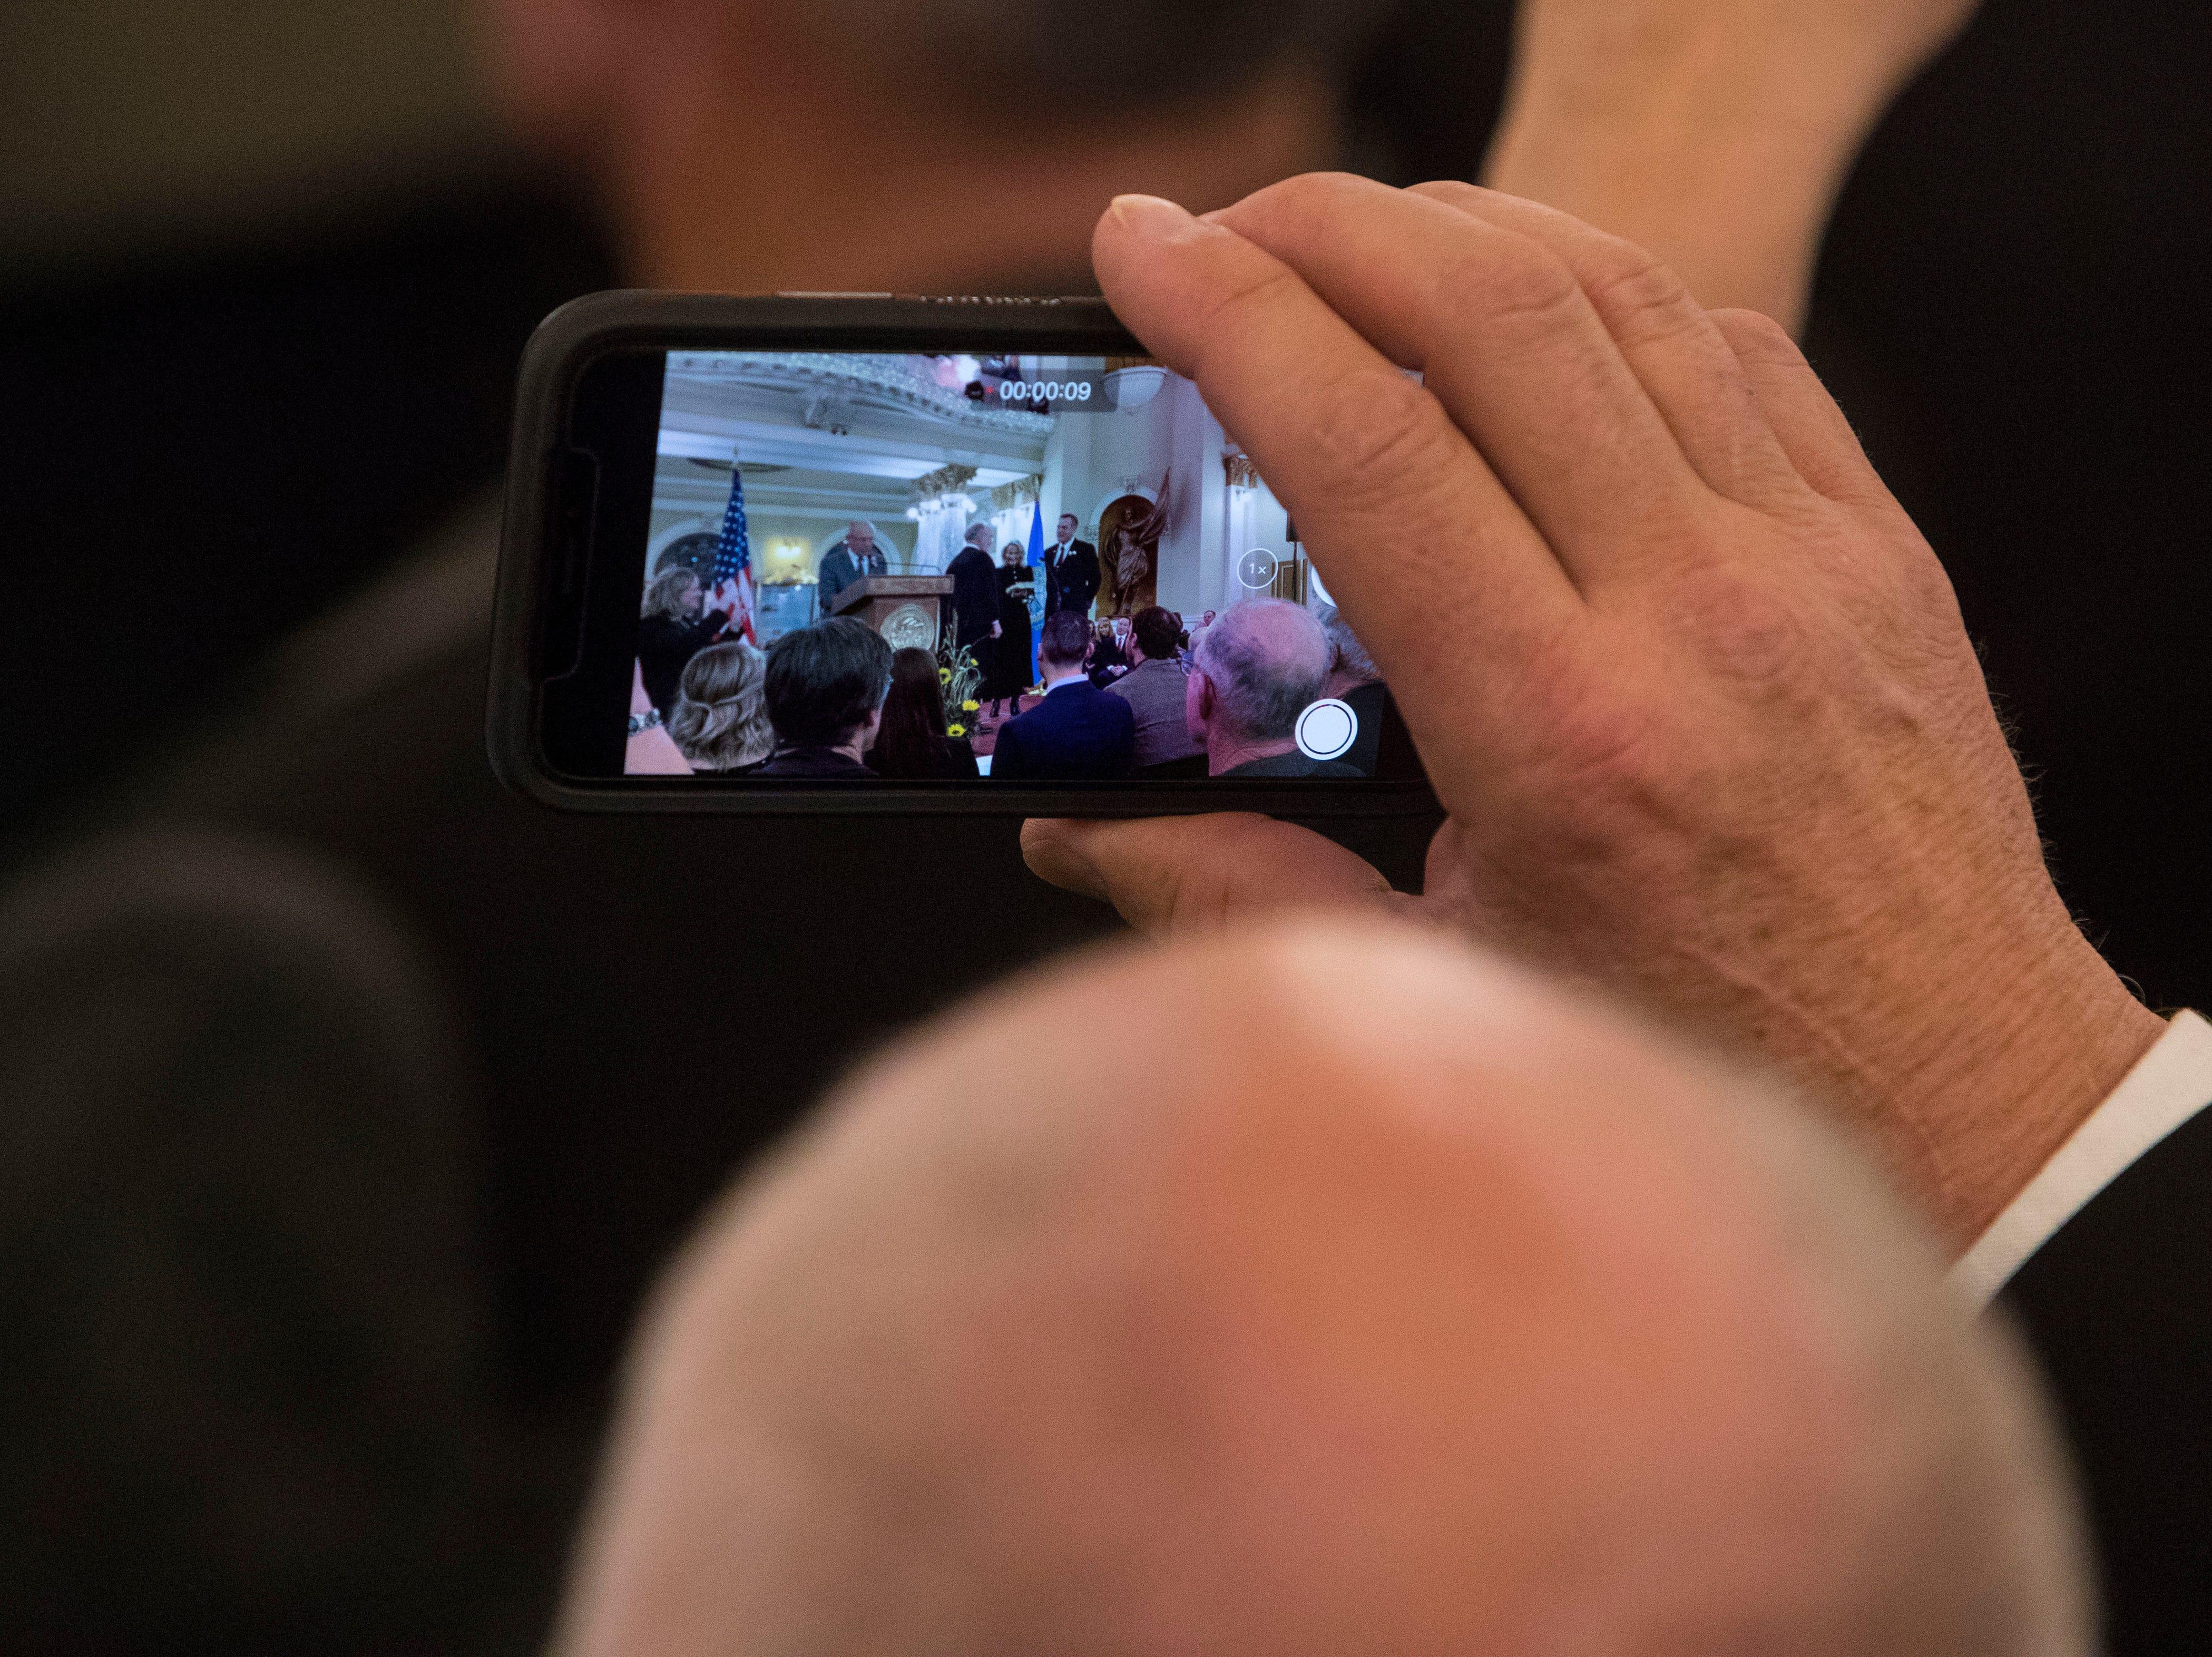 Audience member records Lt. Gov.-elect Larry Rhoden's swearing in ceremony, Saturday, Jan. 5, 2019 in Pierre, S.D.